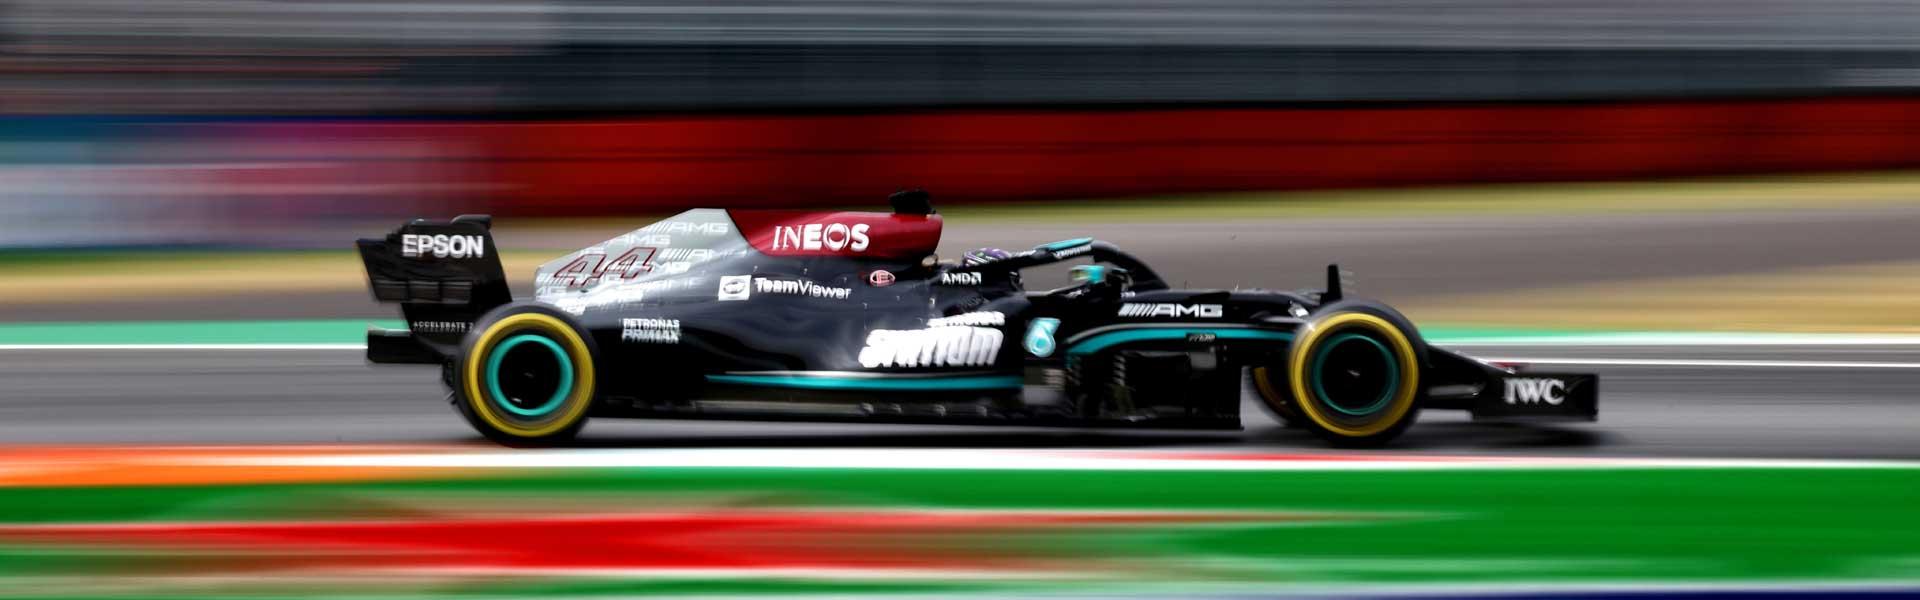 Bottas in P3, Hamilton out of the Italian GP!